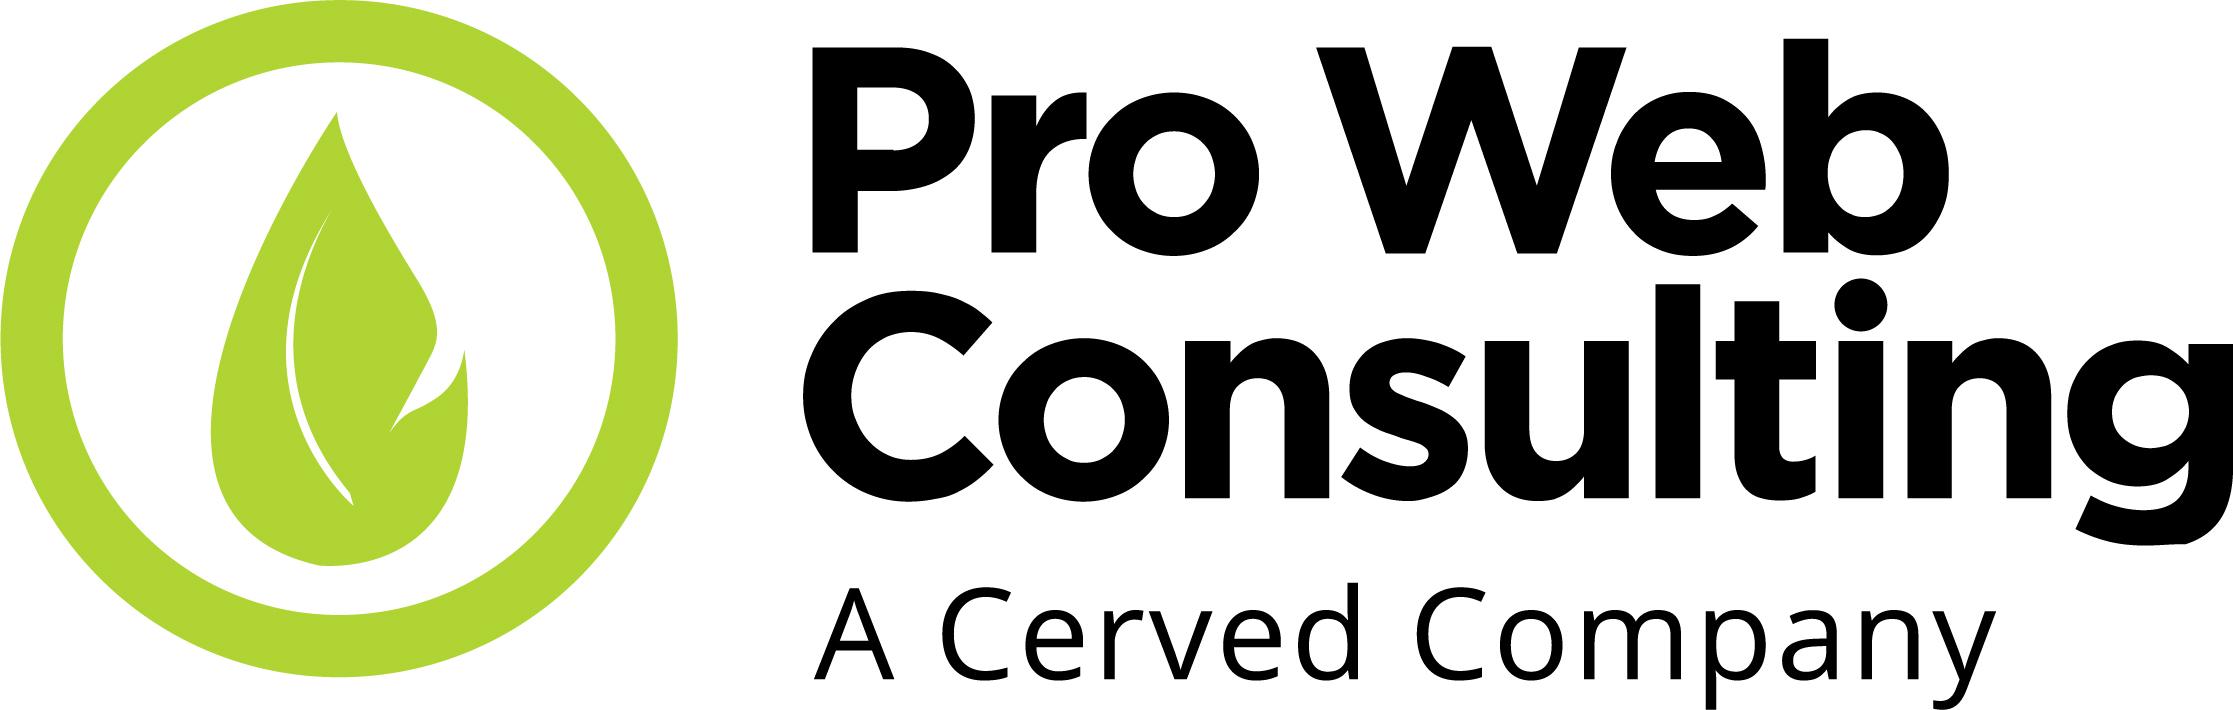 pro web consulting-nuovo logo